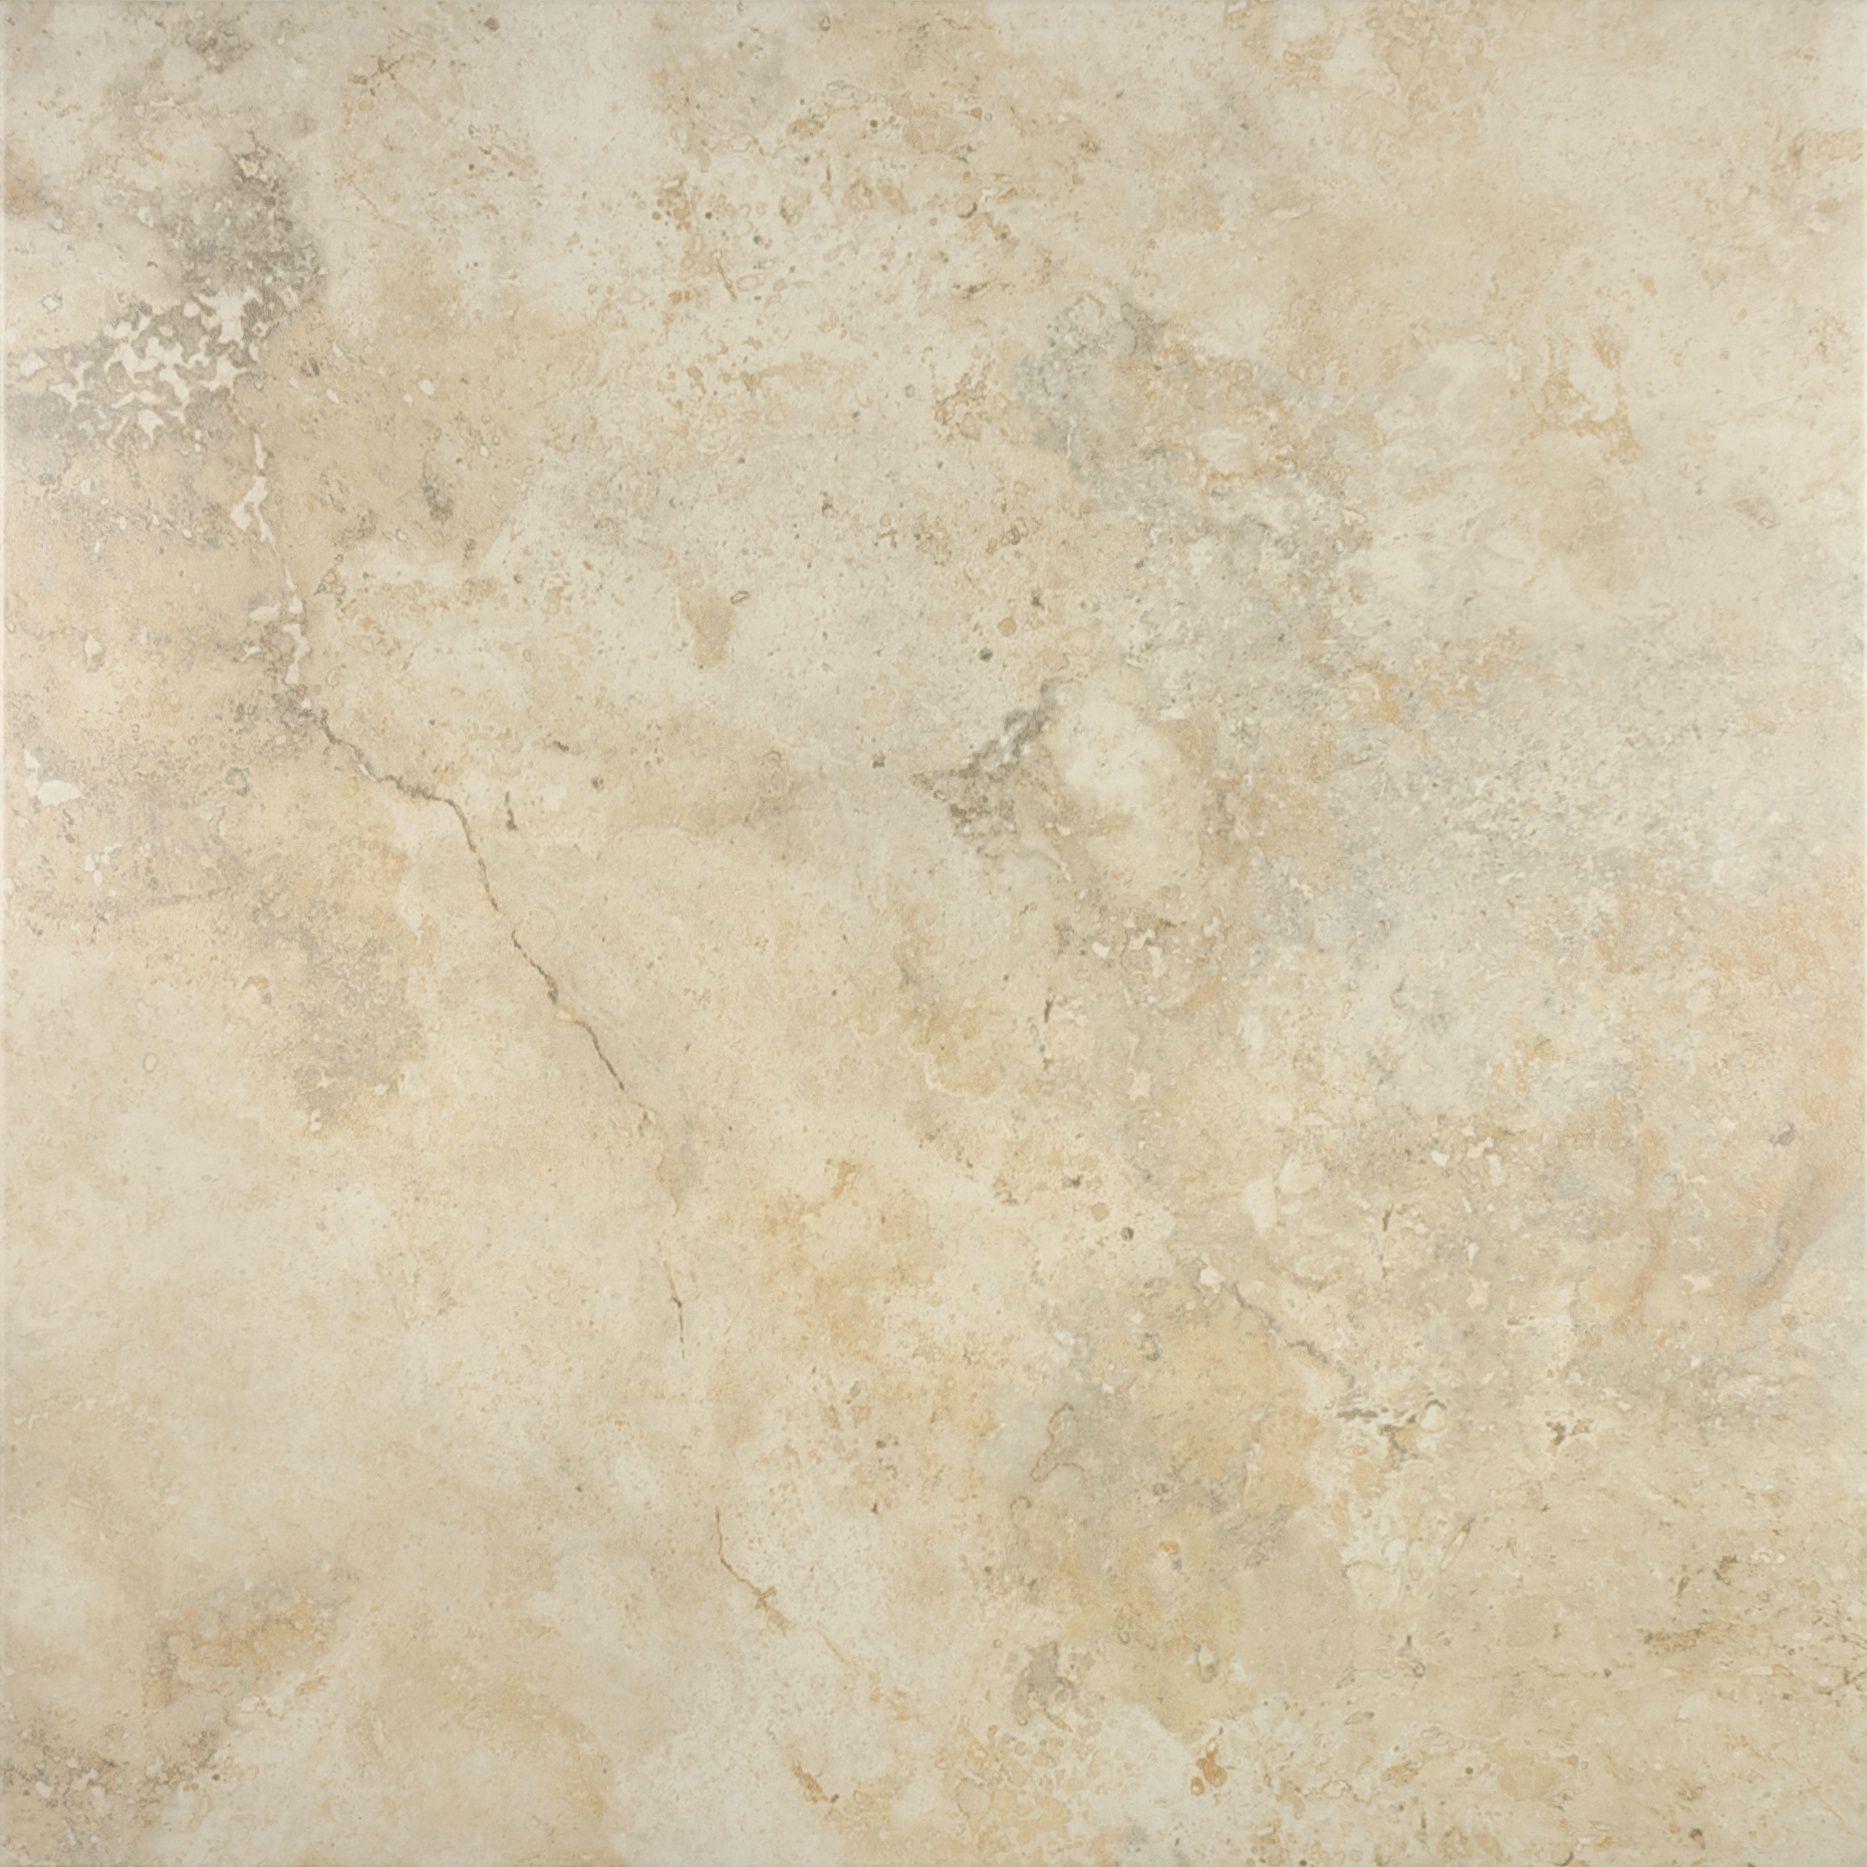 67 027 18 X18 Capri Sand Porcelain Tile